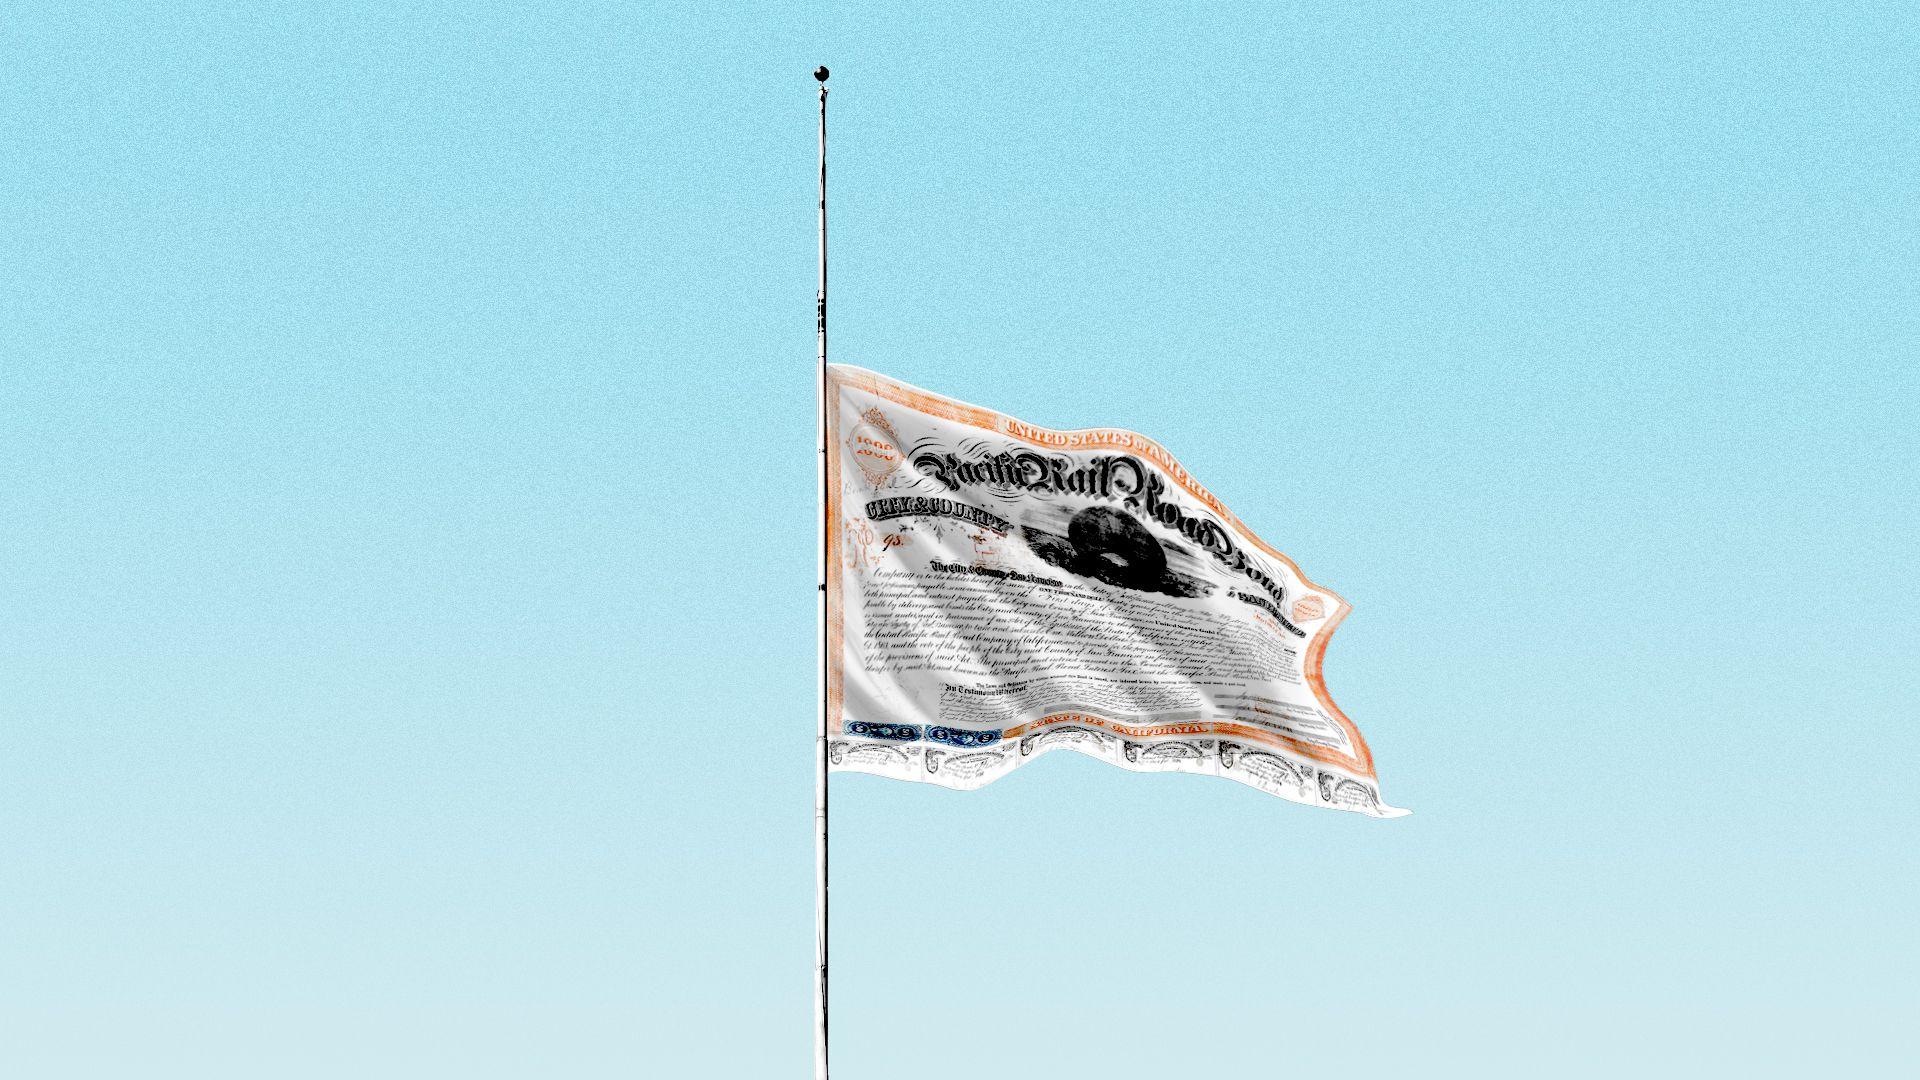 Illustration of a bond as a flag flying at half mast.